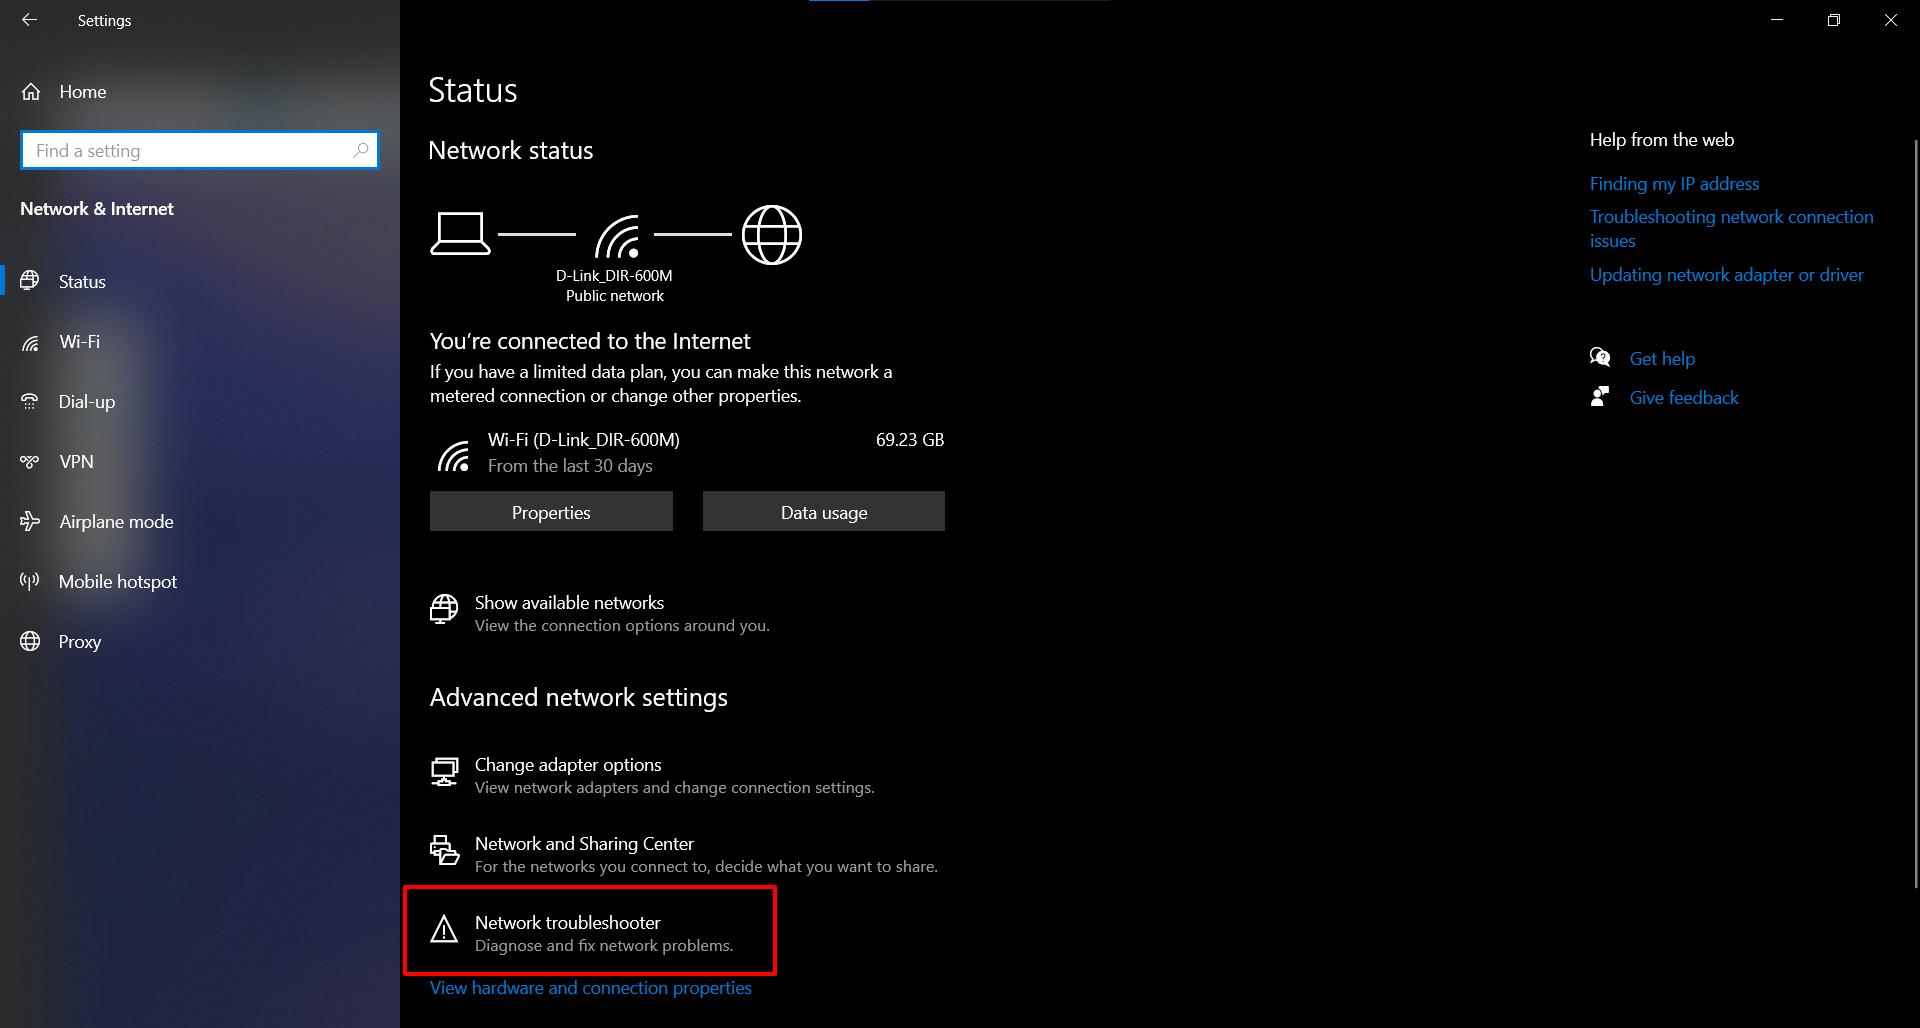 Fix No Internet Access using Windows 10 Network Troubleshooter